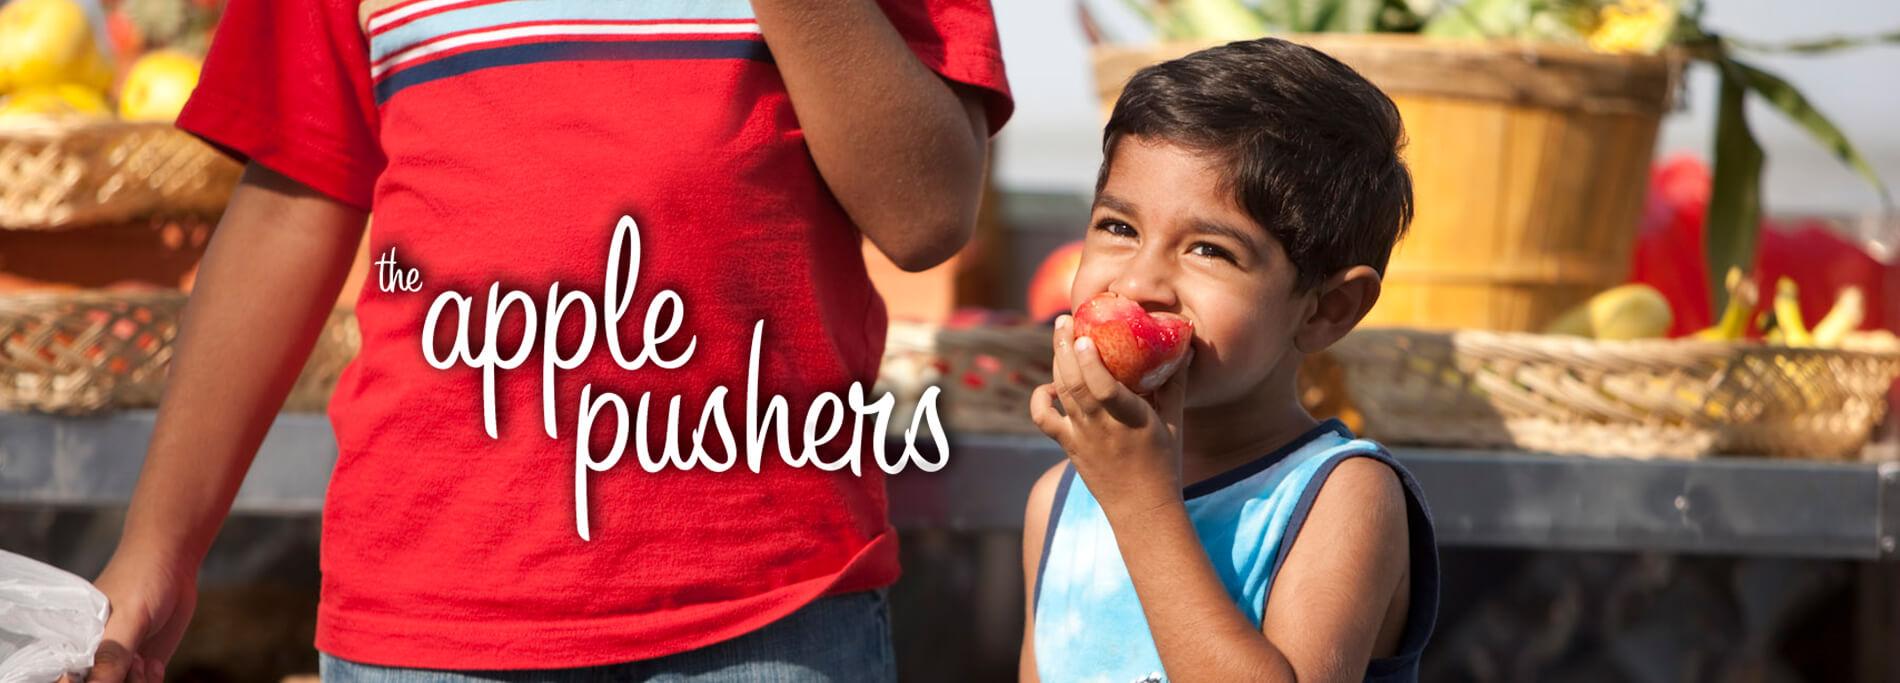 The Apple Pushers trailer photo